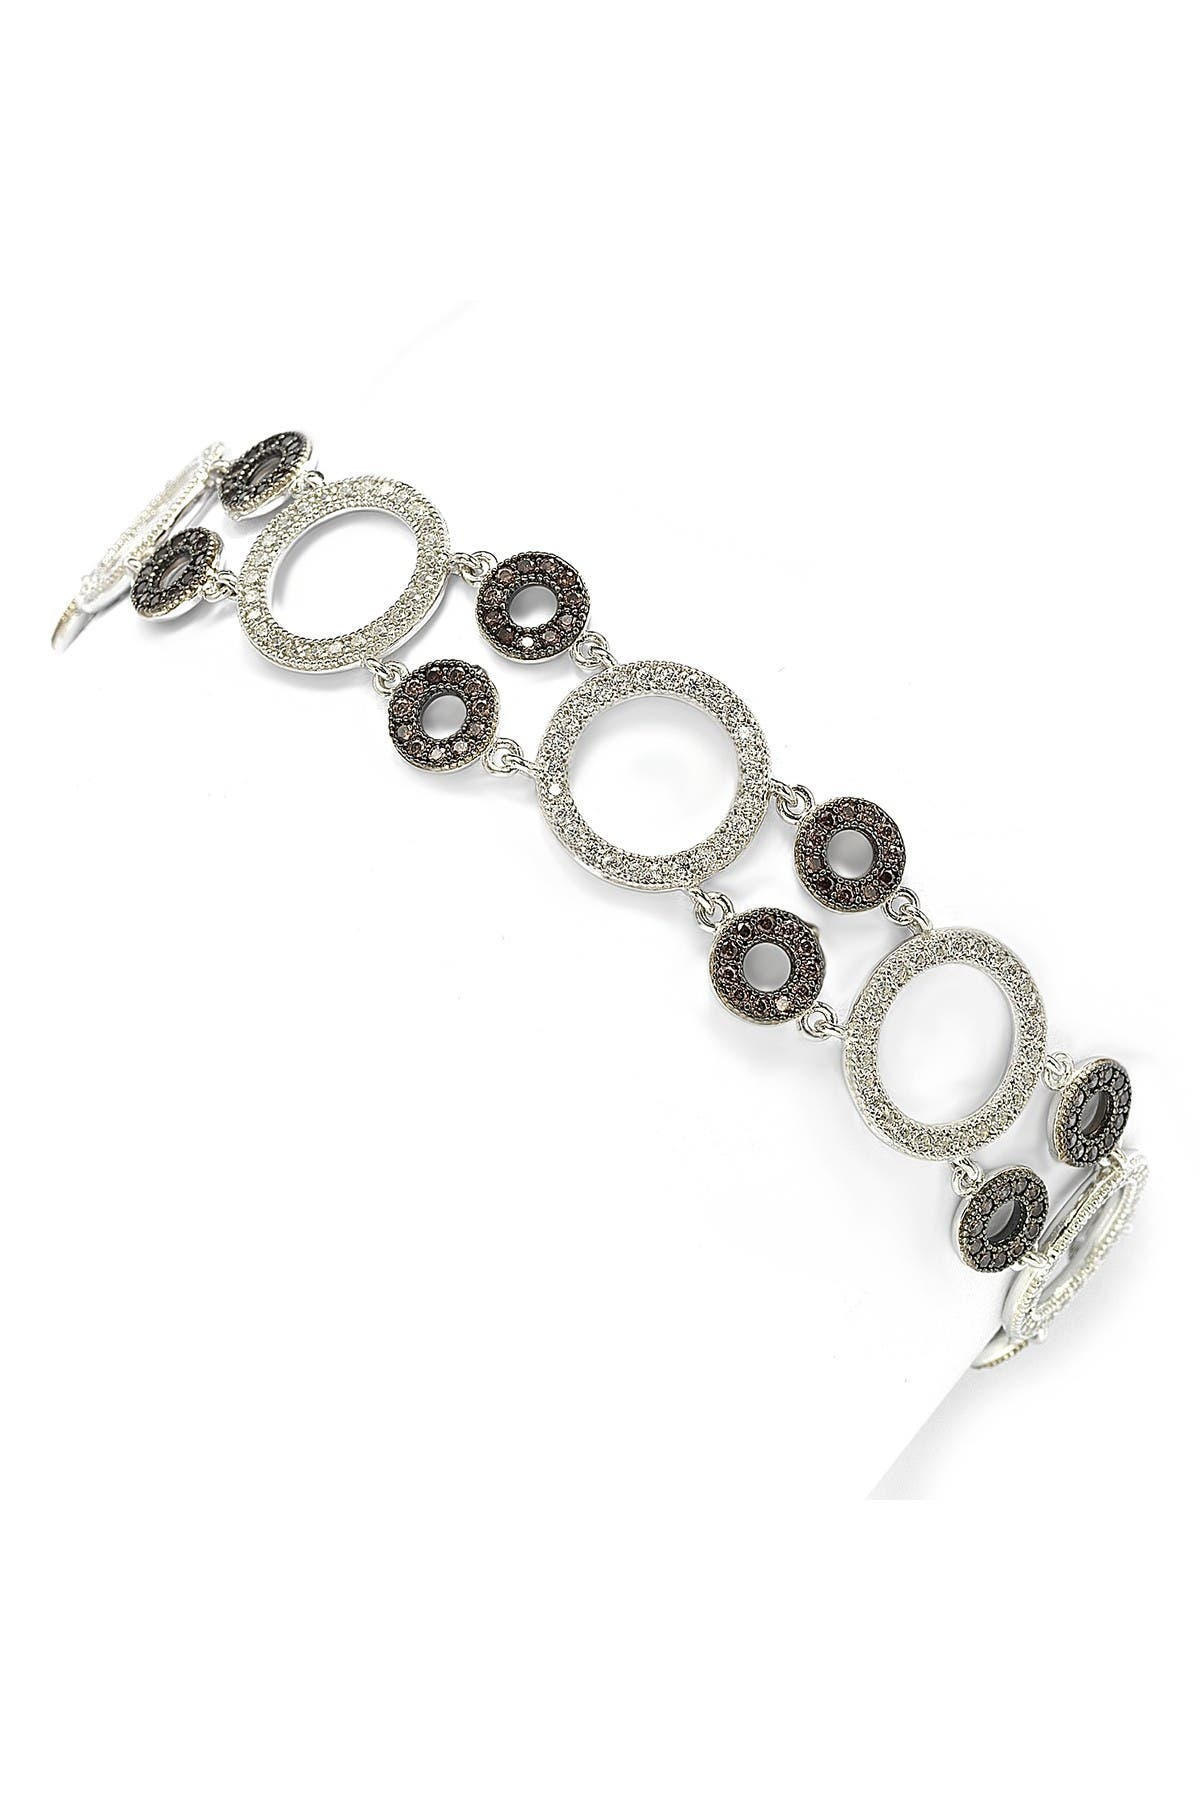 Image of Suzy Levian Sterling Silver CZ Circle Link Bracelet